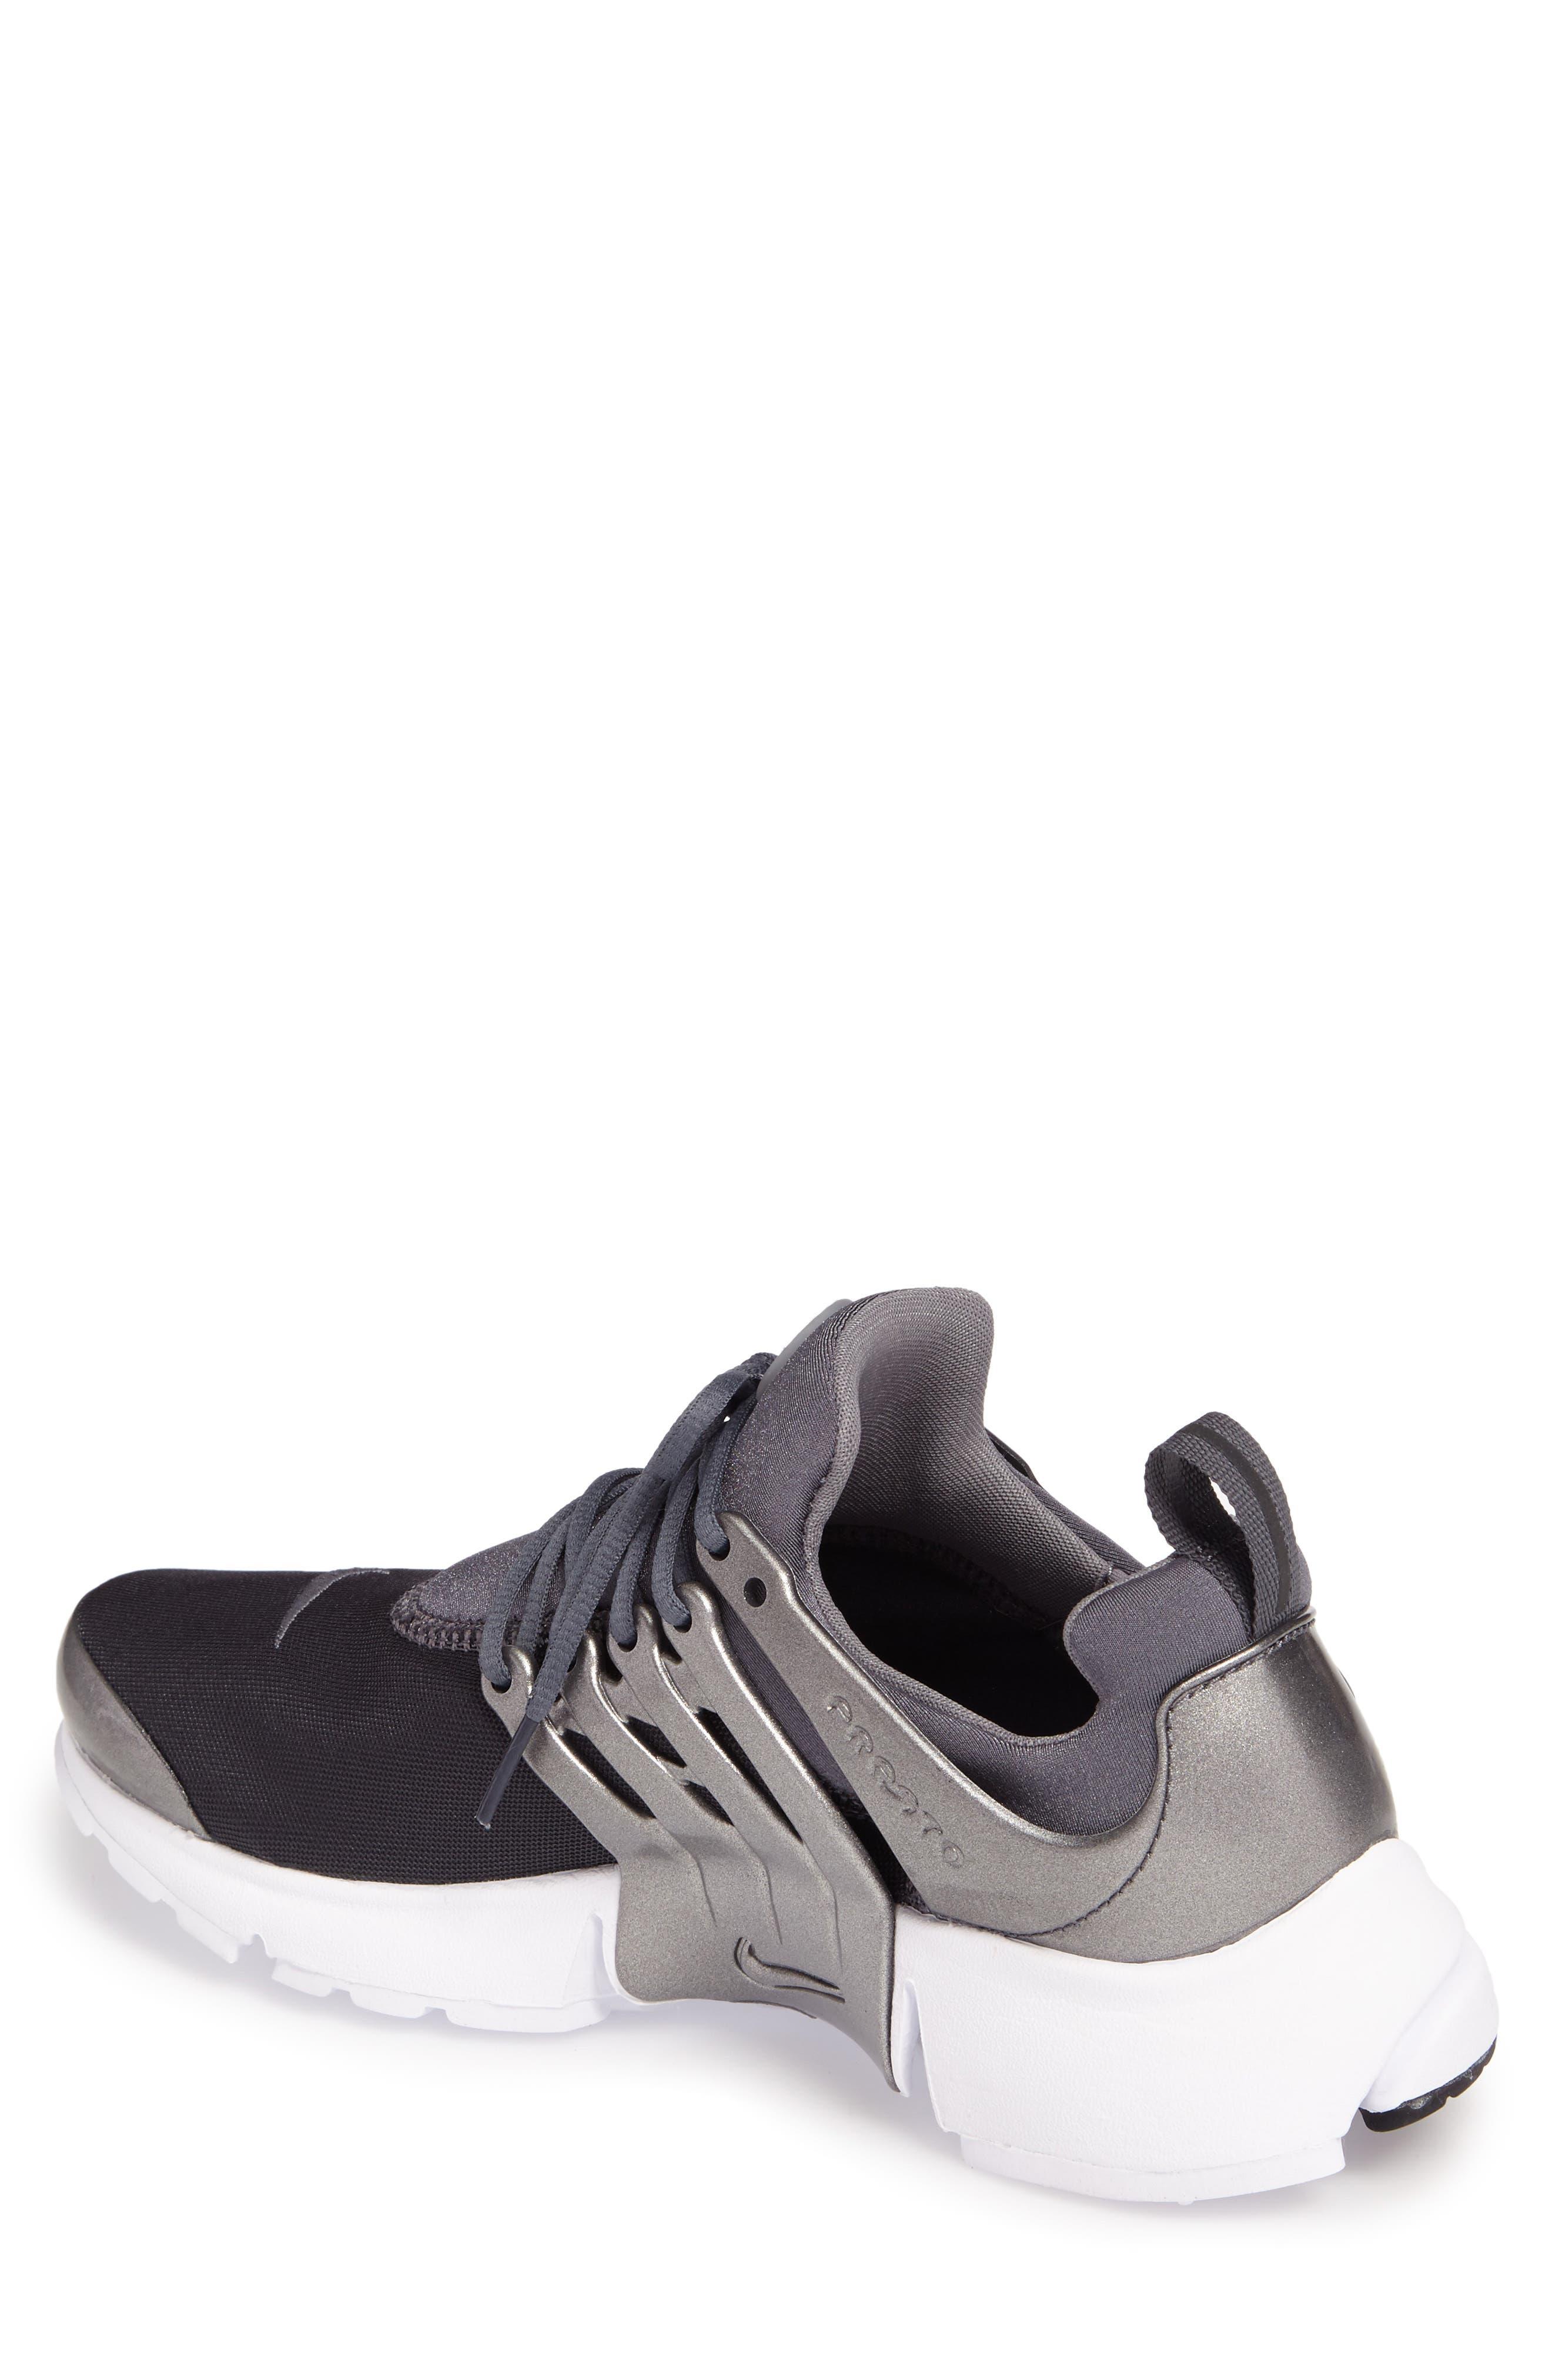 Air Presto Premium Sneaker,                             Alternate thumbnail 2, color,                             Metallic Hematite/ Cool Grey